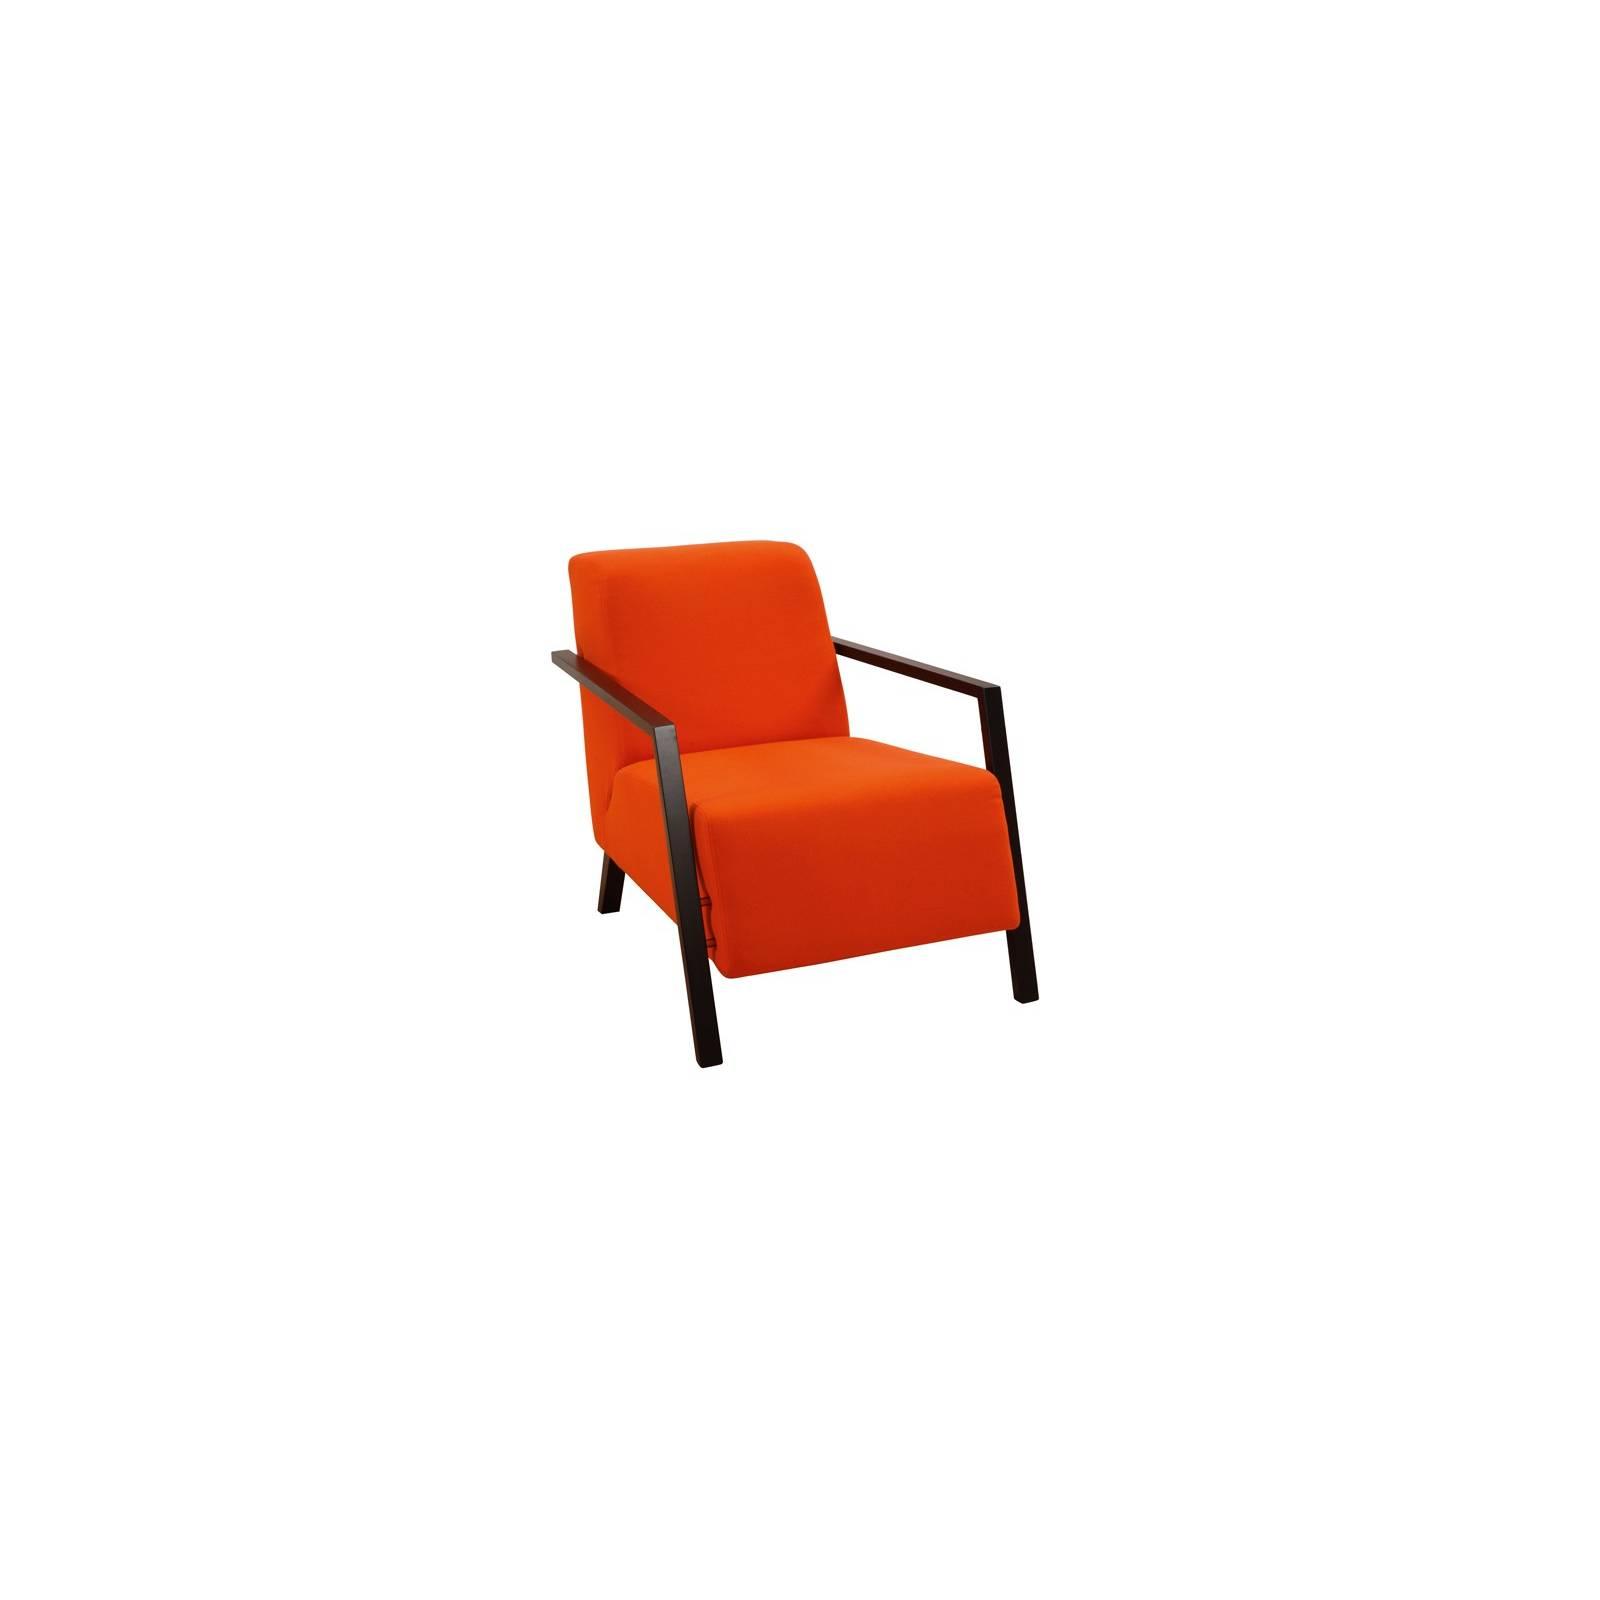 Fauteuil Foxi Tissu - fauteuil personnalisable